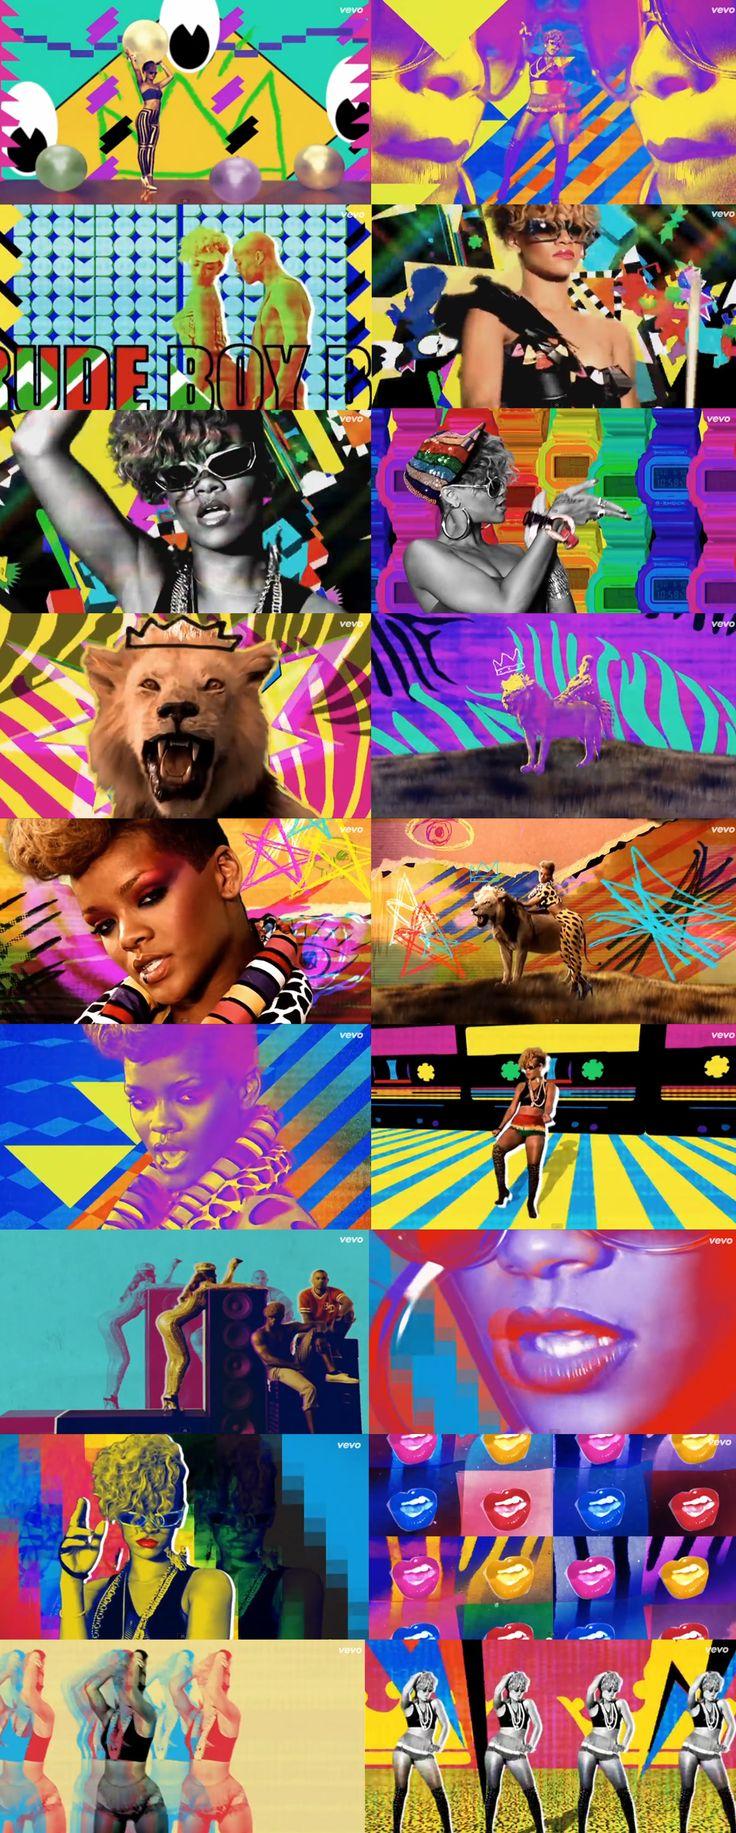 Rihanna - Rude Boy (video pt.2)